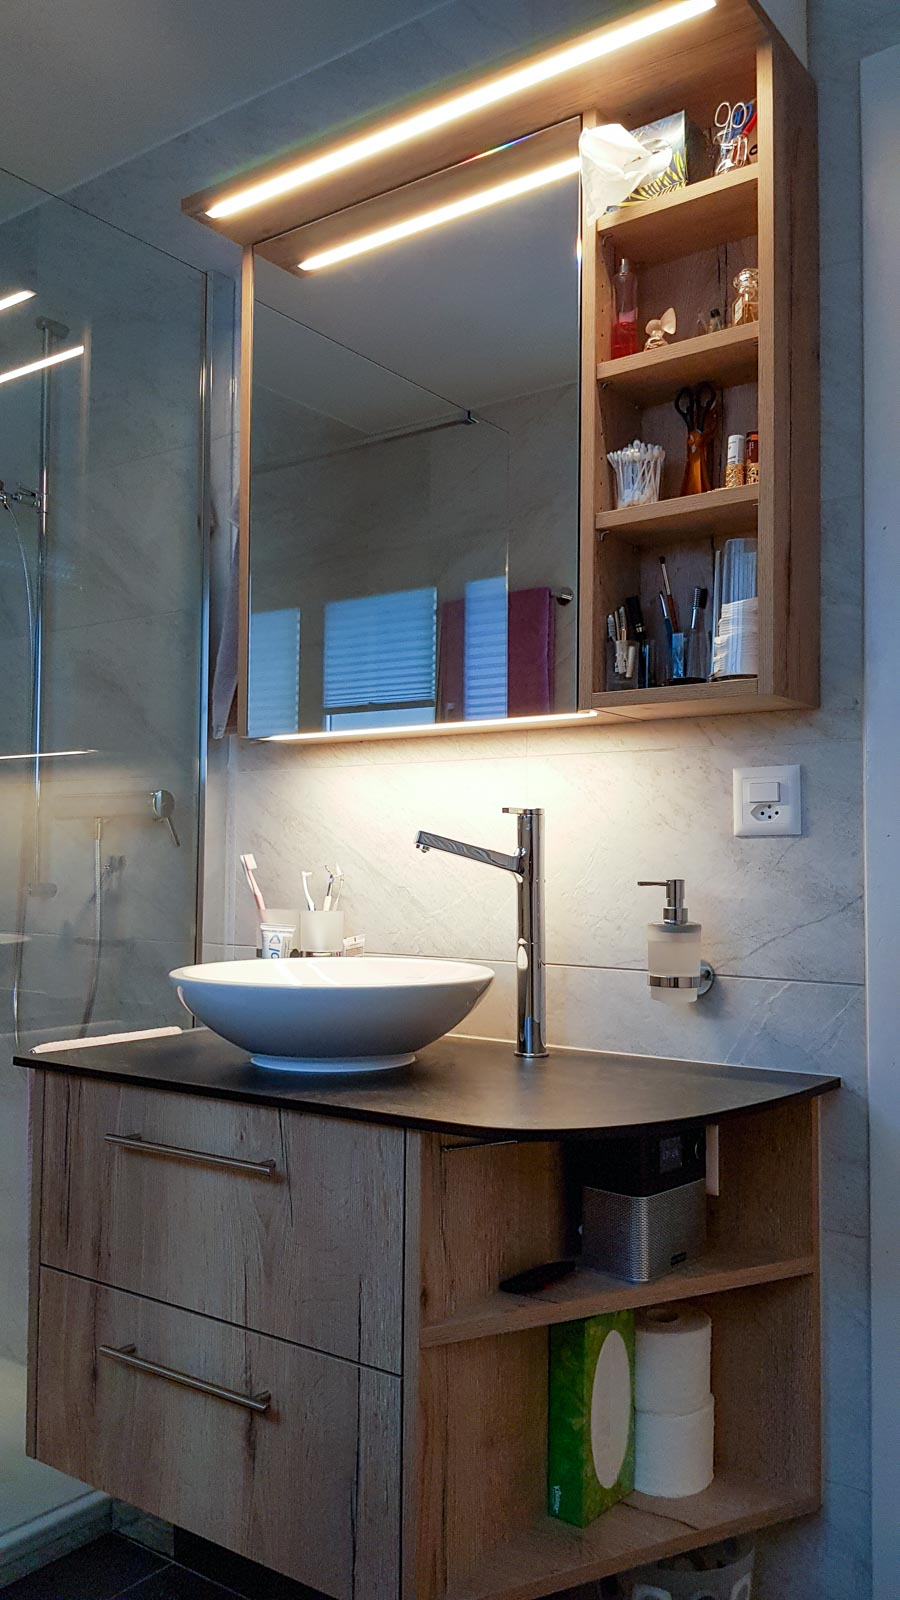 Wooddesign_Badmöbel_ Badumbau_LED Beleuchtung_Holzdecor_Vollkernplatte_Becken aufgesetzt (2)